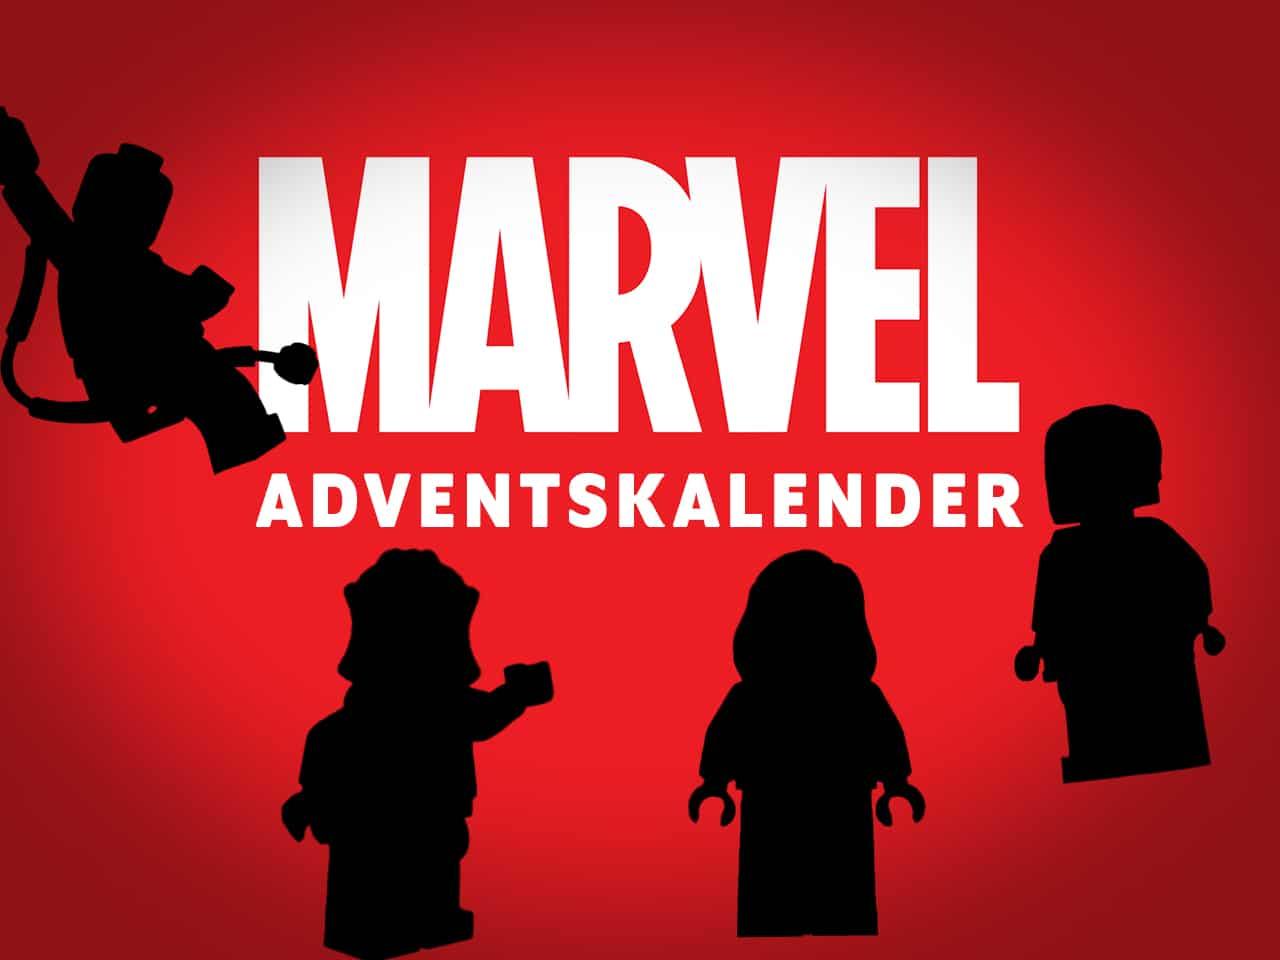 Disney Adventskalender 2021